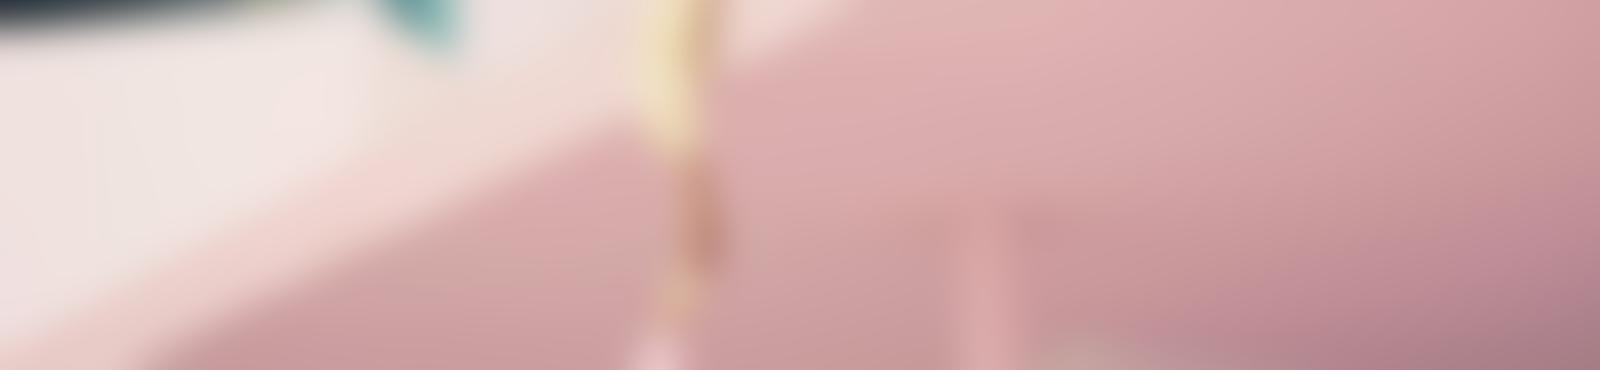 Blurred fce491eb 4cca 406a 8744 368dc6f04d5a